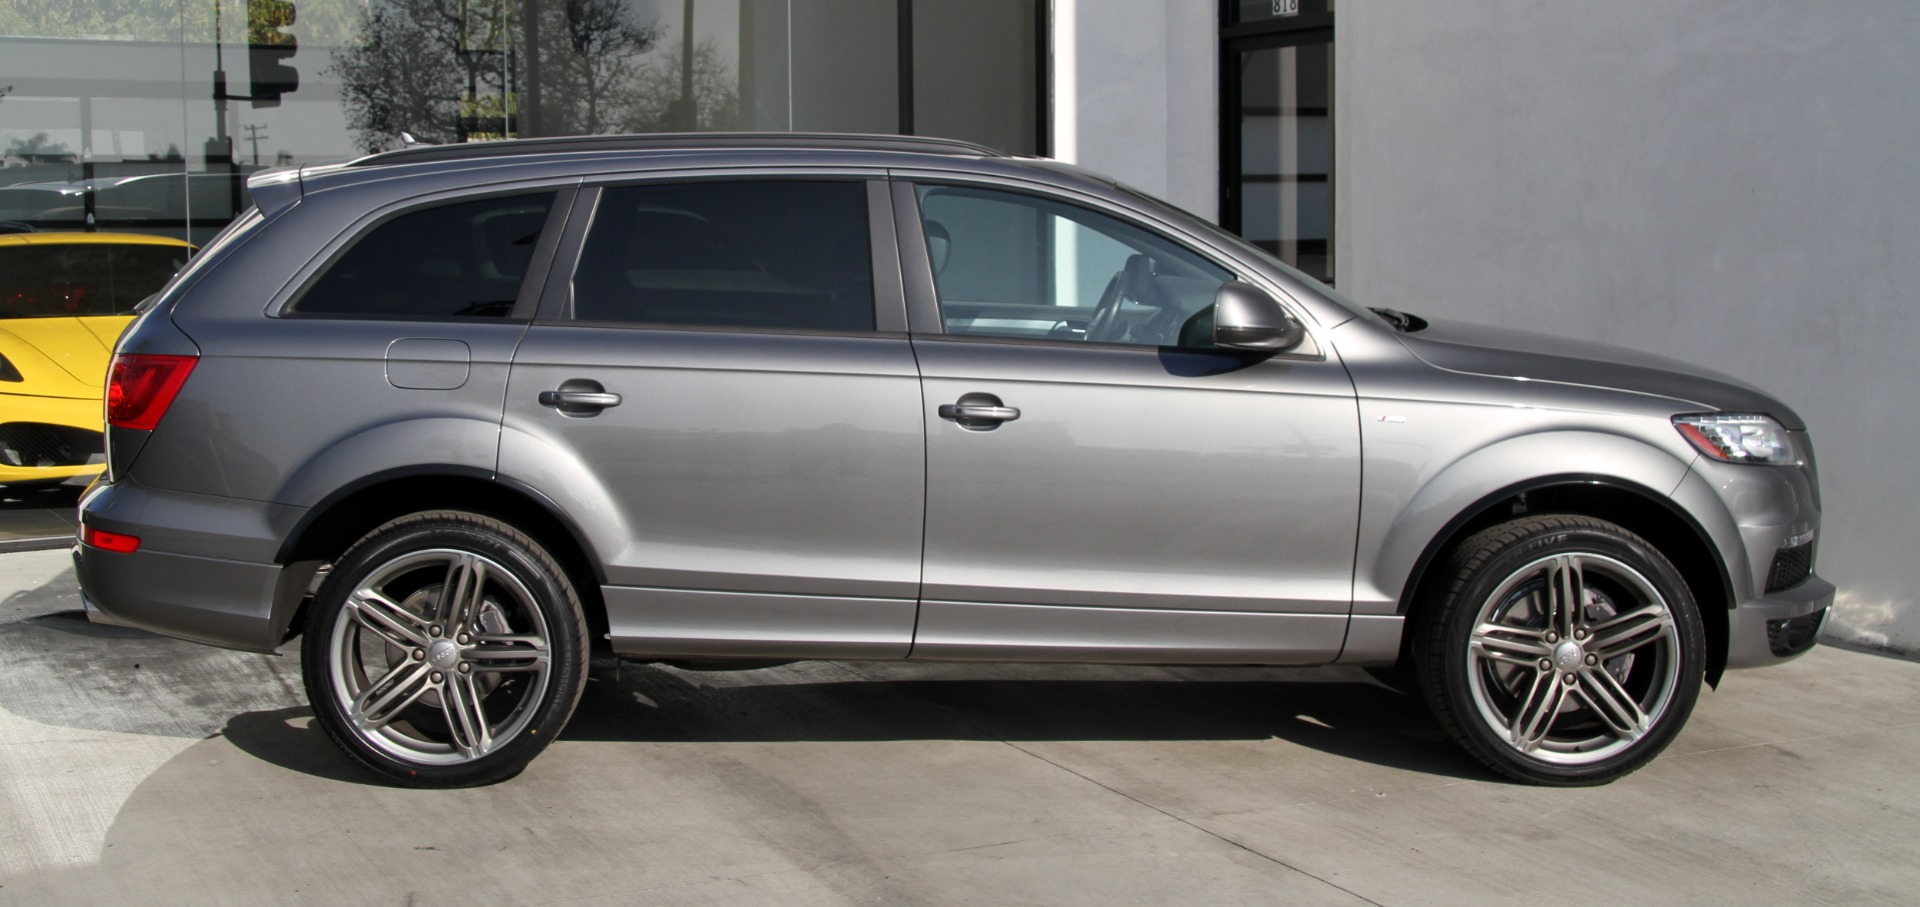 Audi Dealer Near Me >> 2014 Audi Q7 3.0 quattro TDI Prestige Stock # 6052 for ...